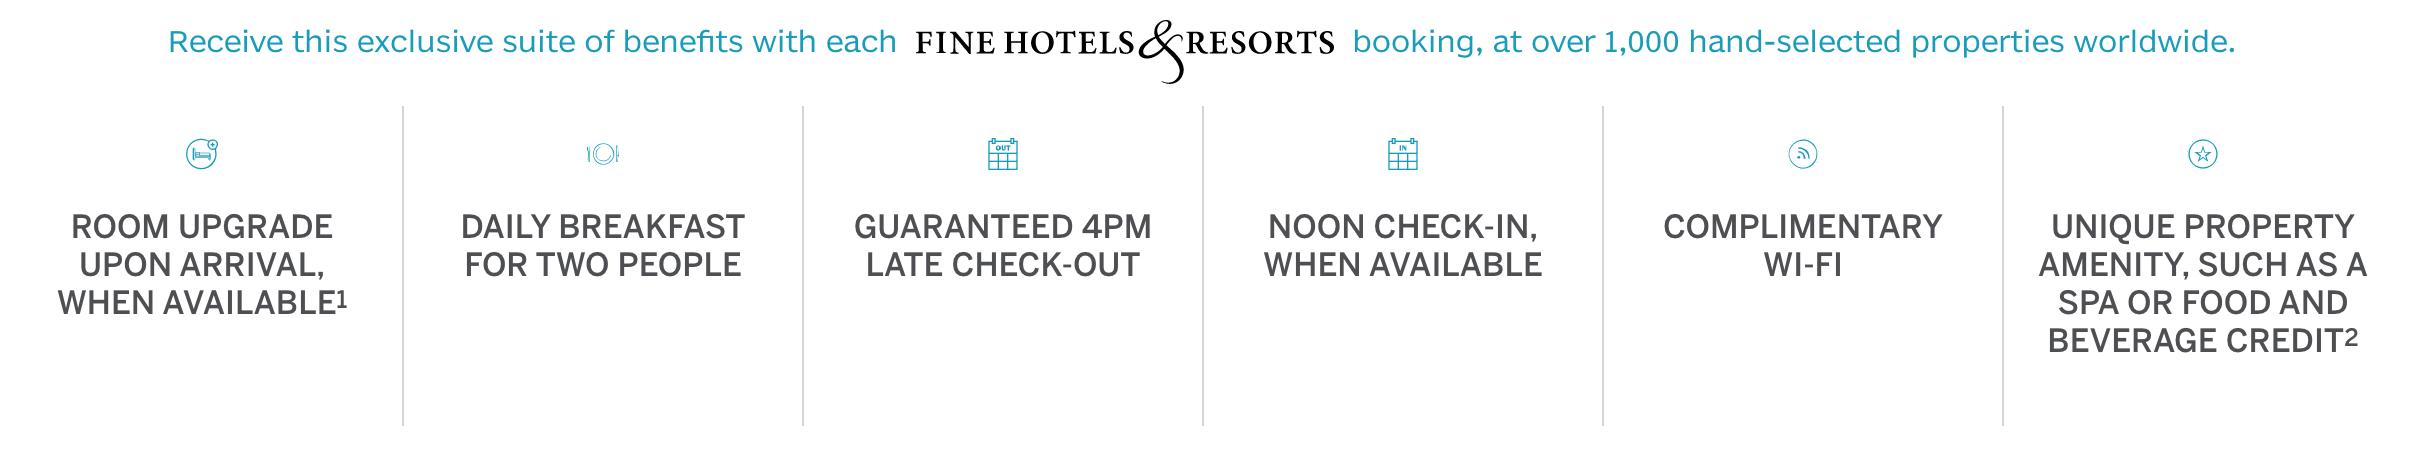 Amex Fine Hotels & Resorts benefits